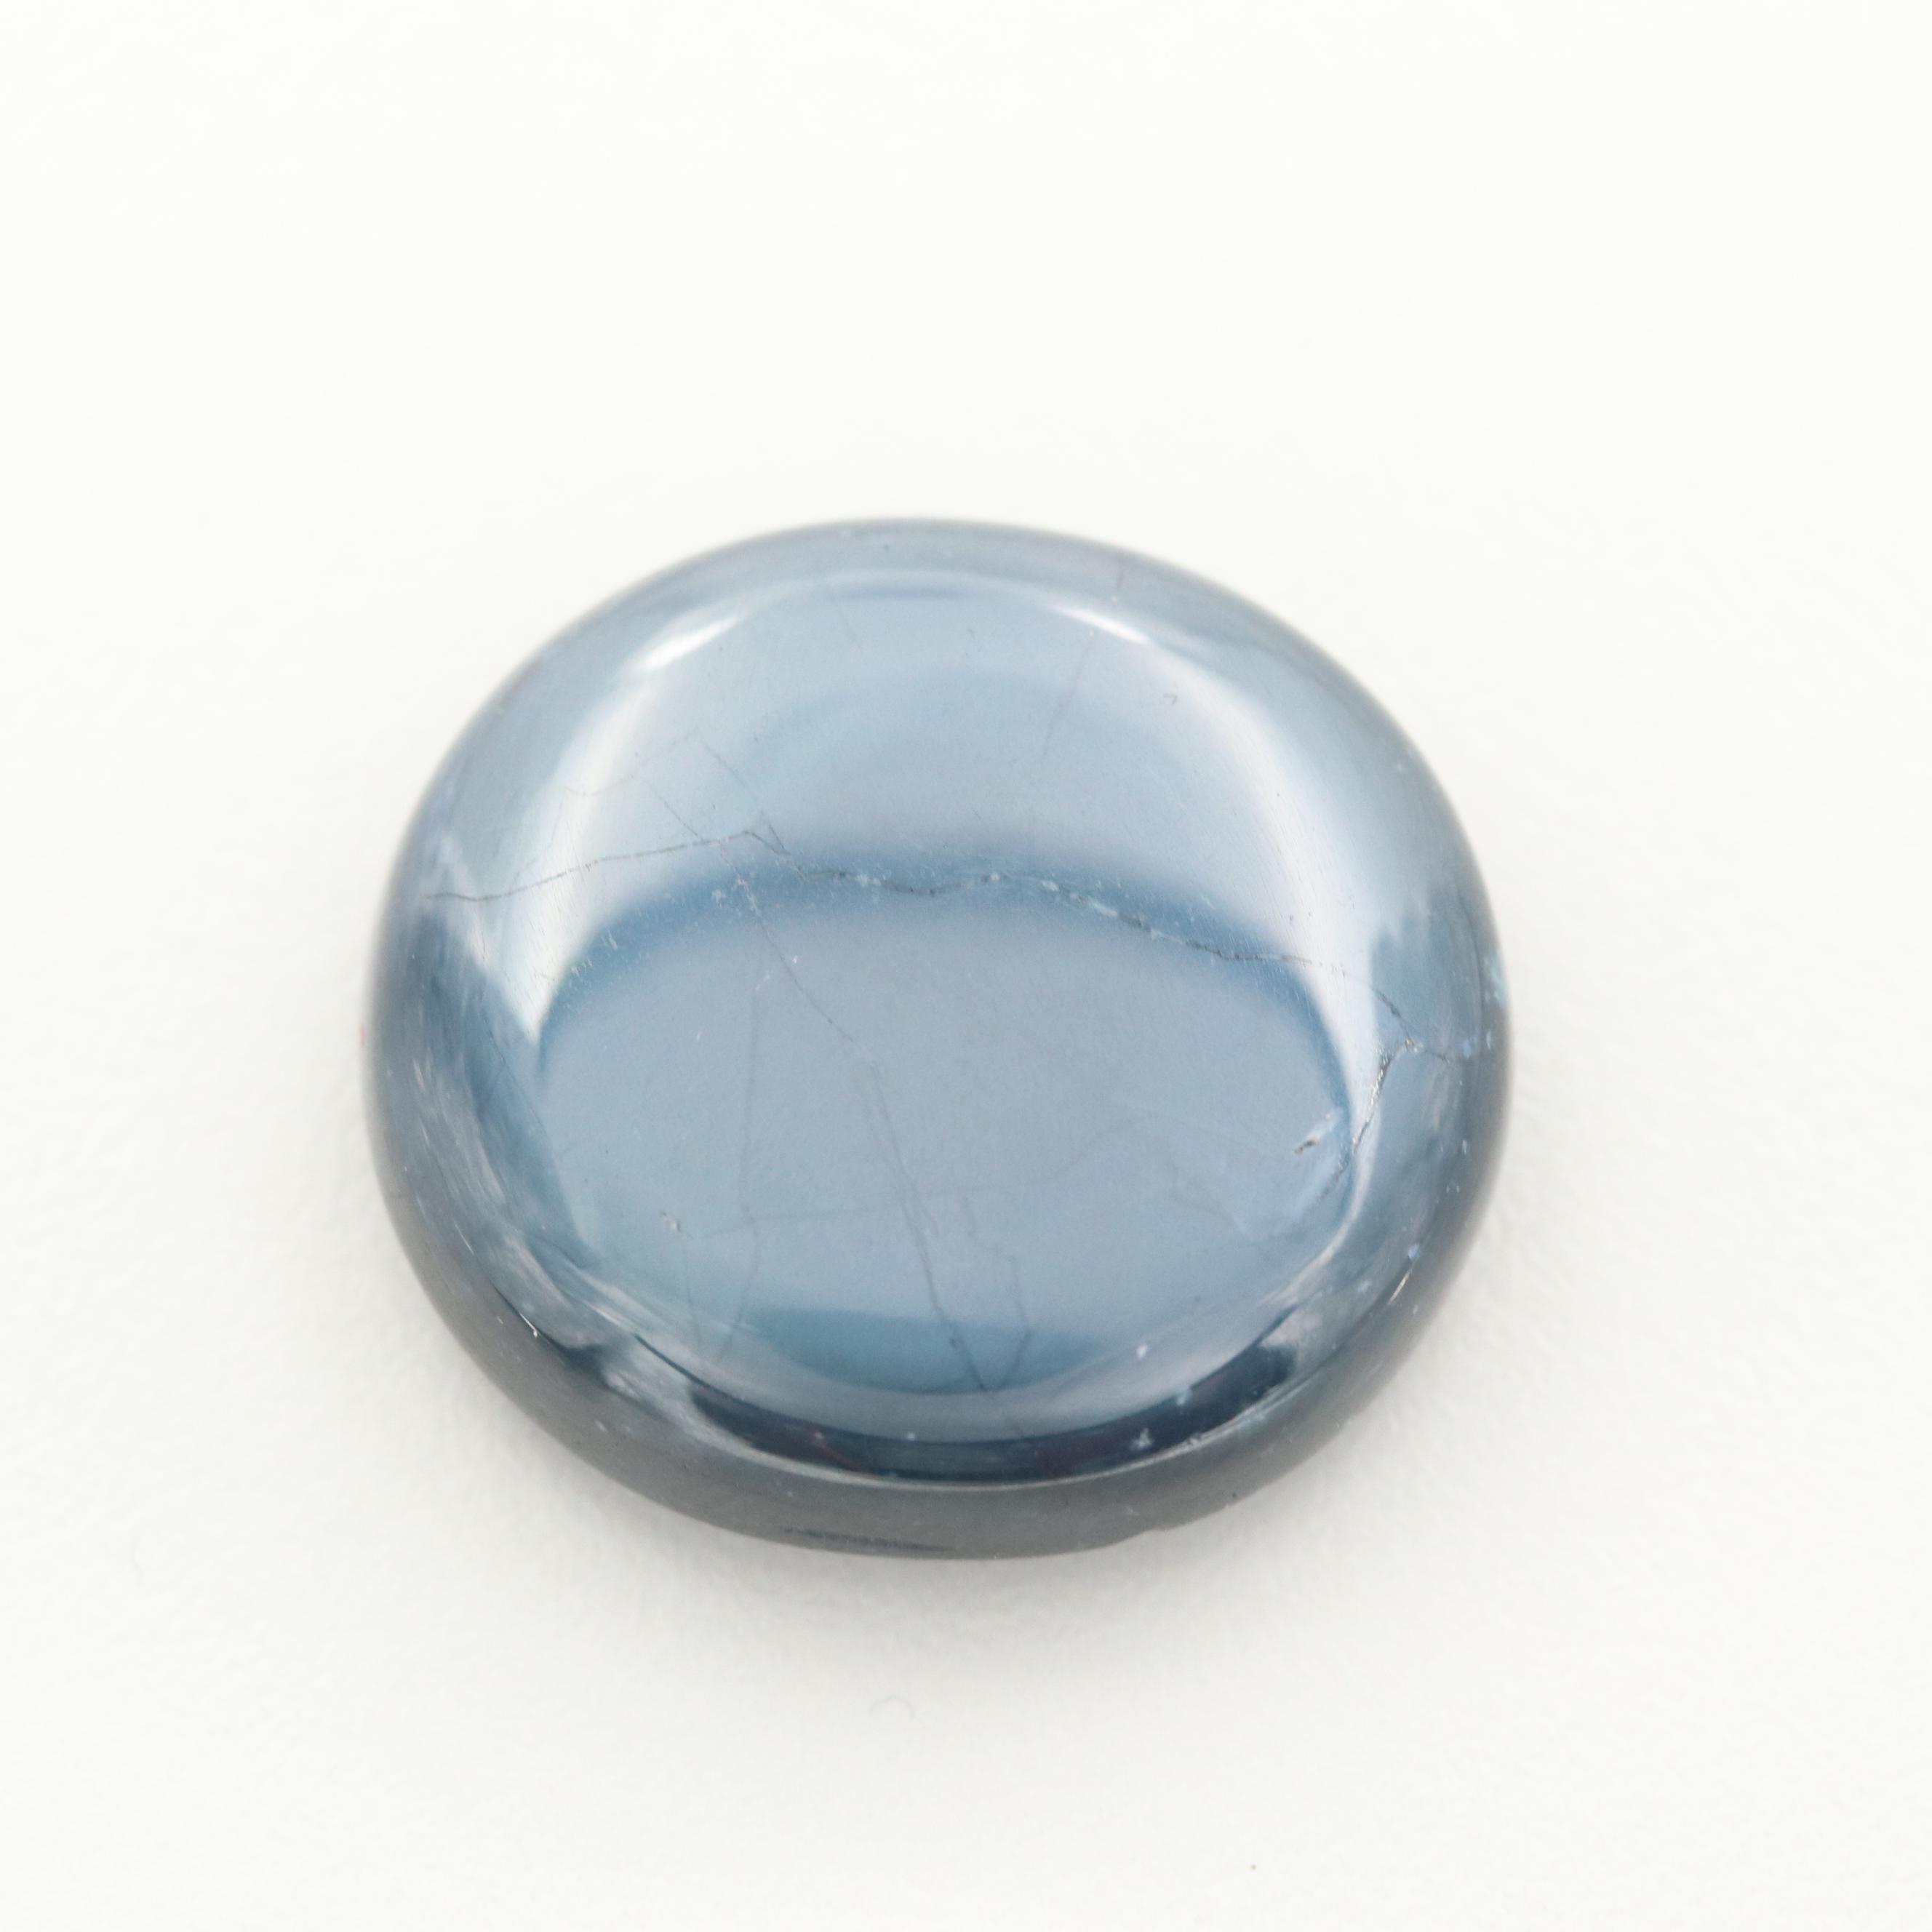 Loose 45.28 CT Sapphire Gemstone